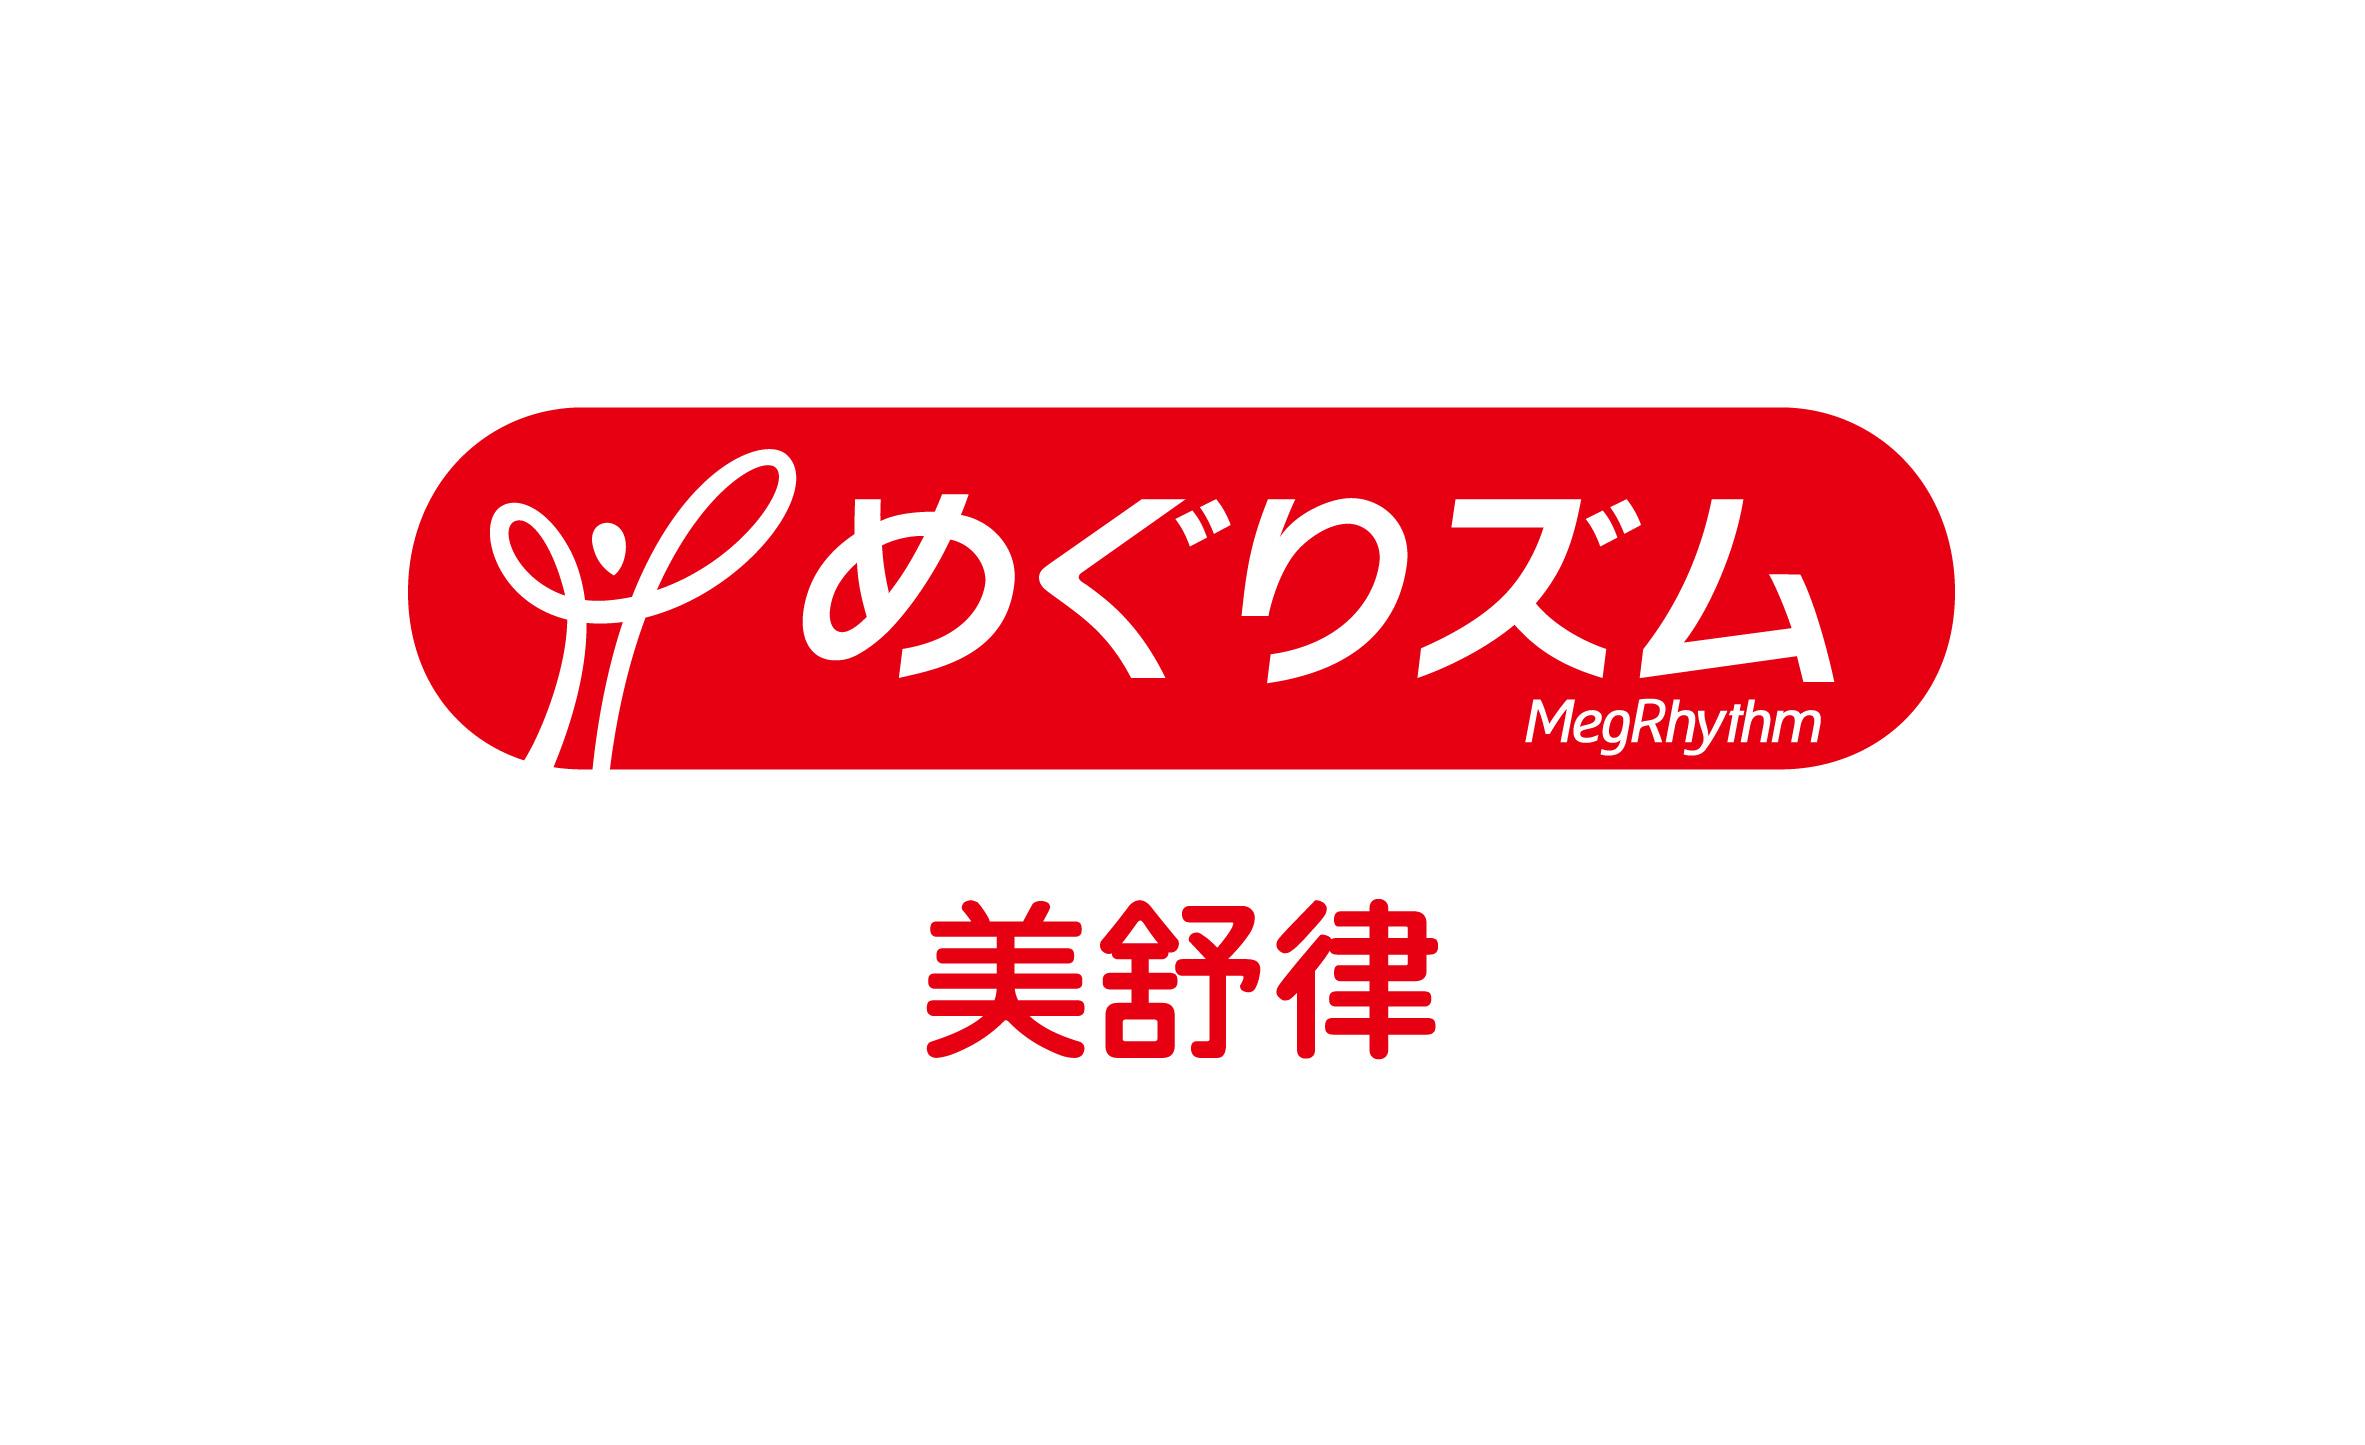 MegRhythm 美舒律